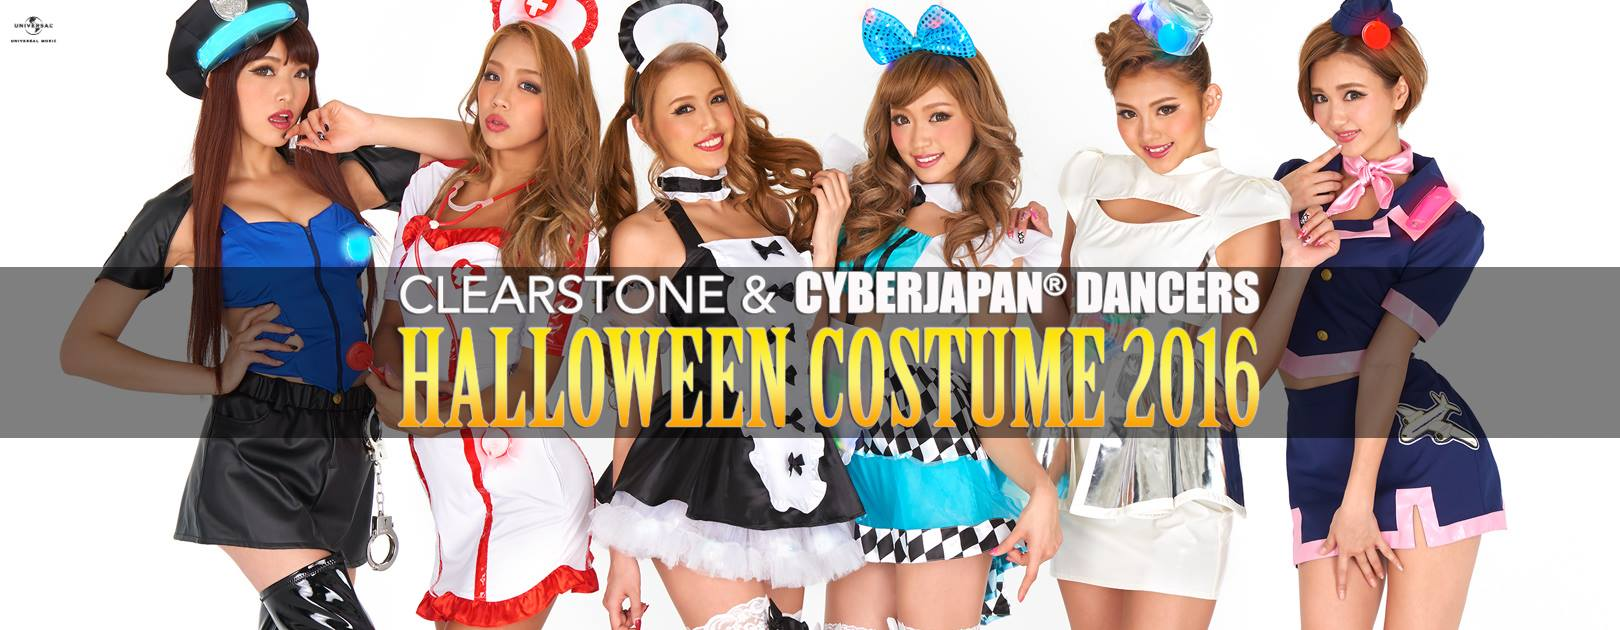 nekopop-cyber-japan-dancers-2016-halloween-clearstone-aa